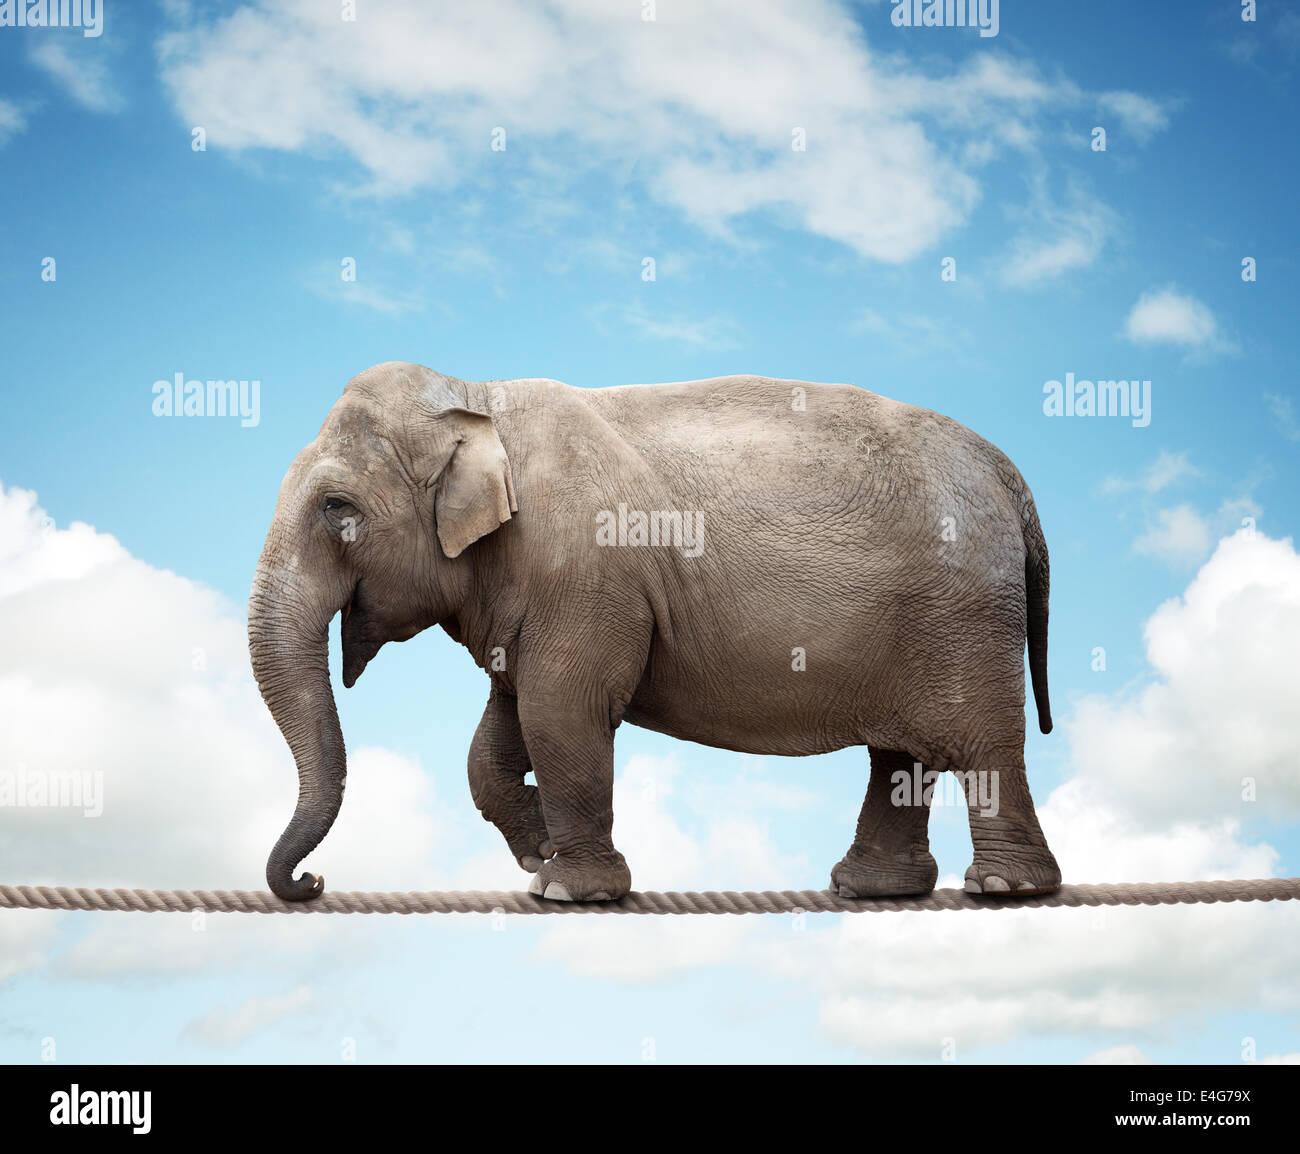 Elephant on tightrope - Stock Image